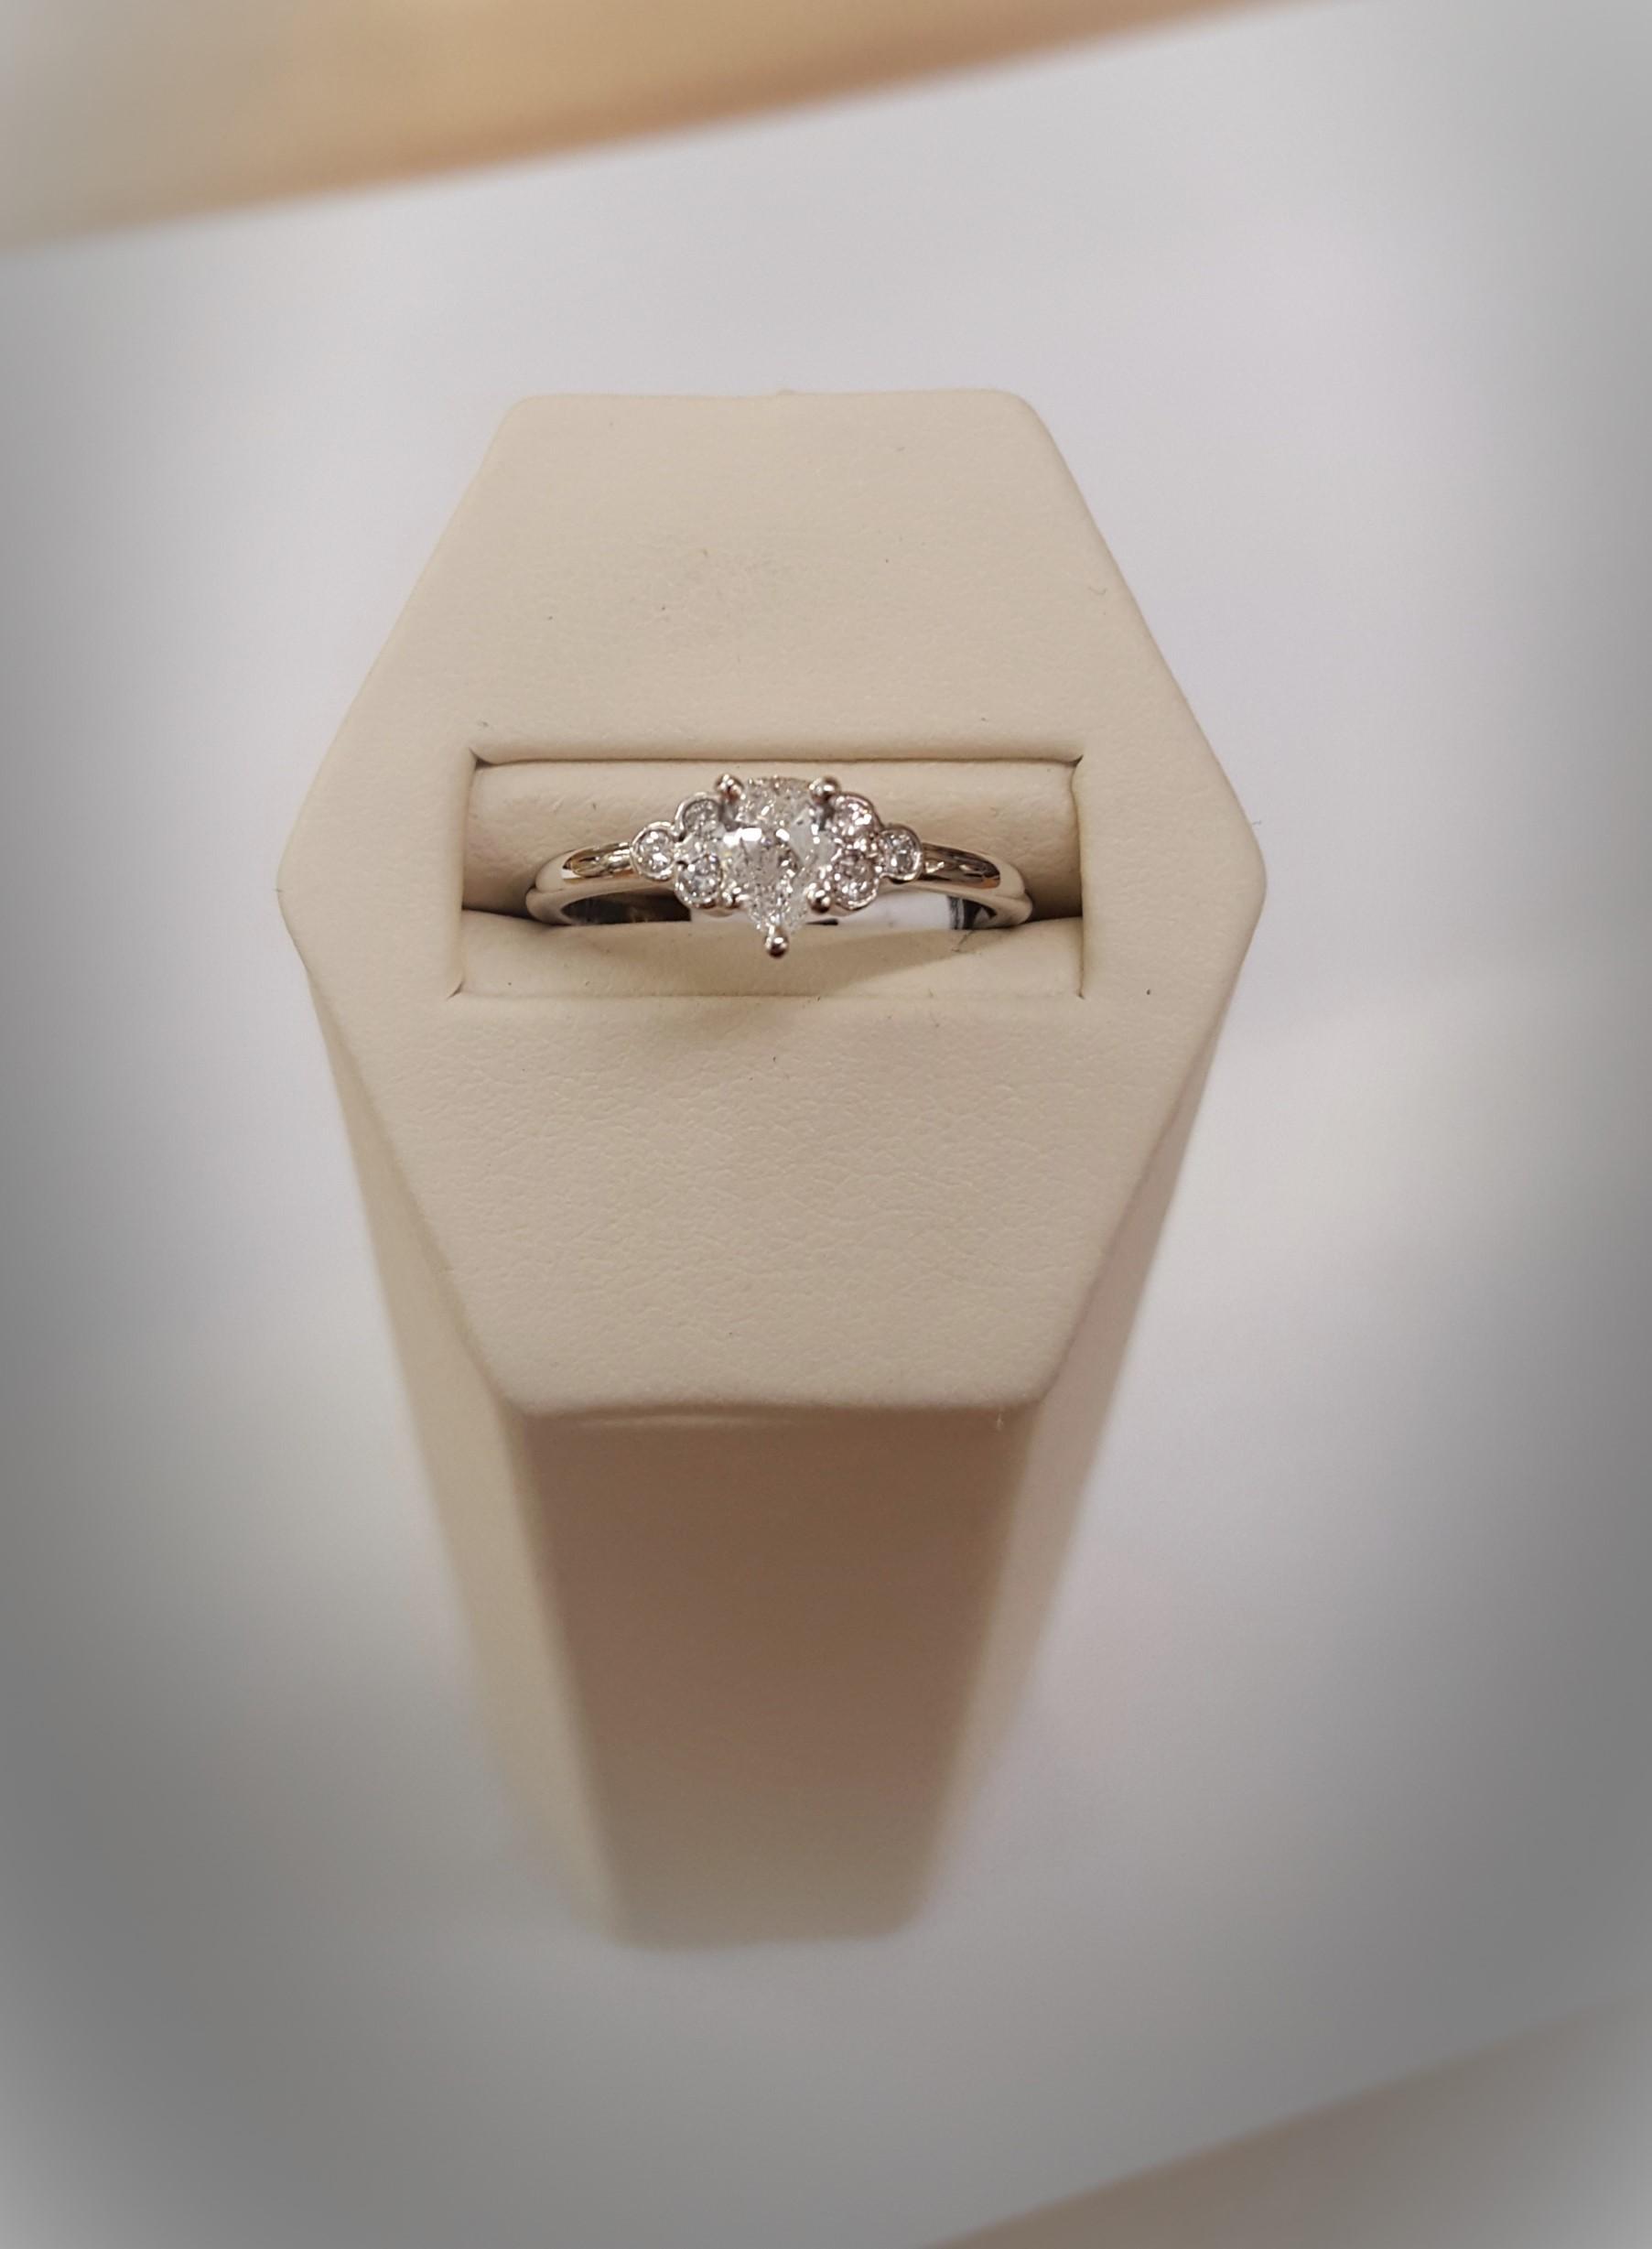 .40ct Pear Cut Diamond Solitaire